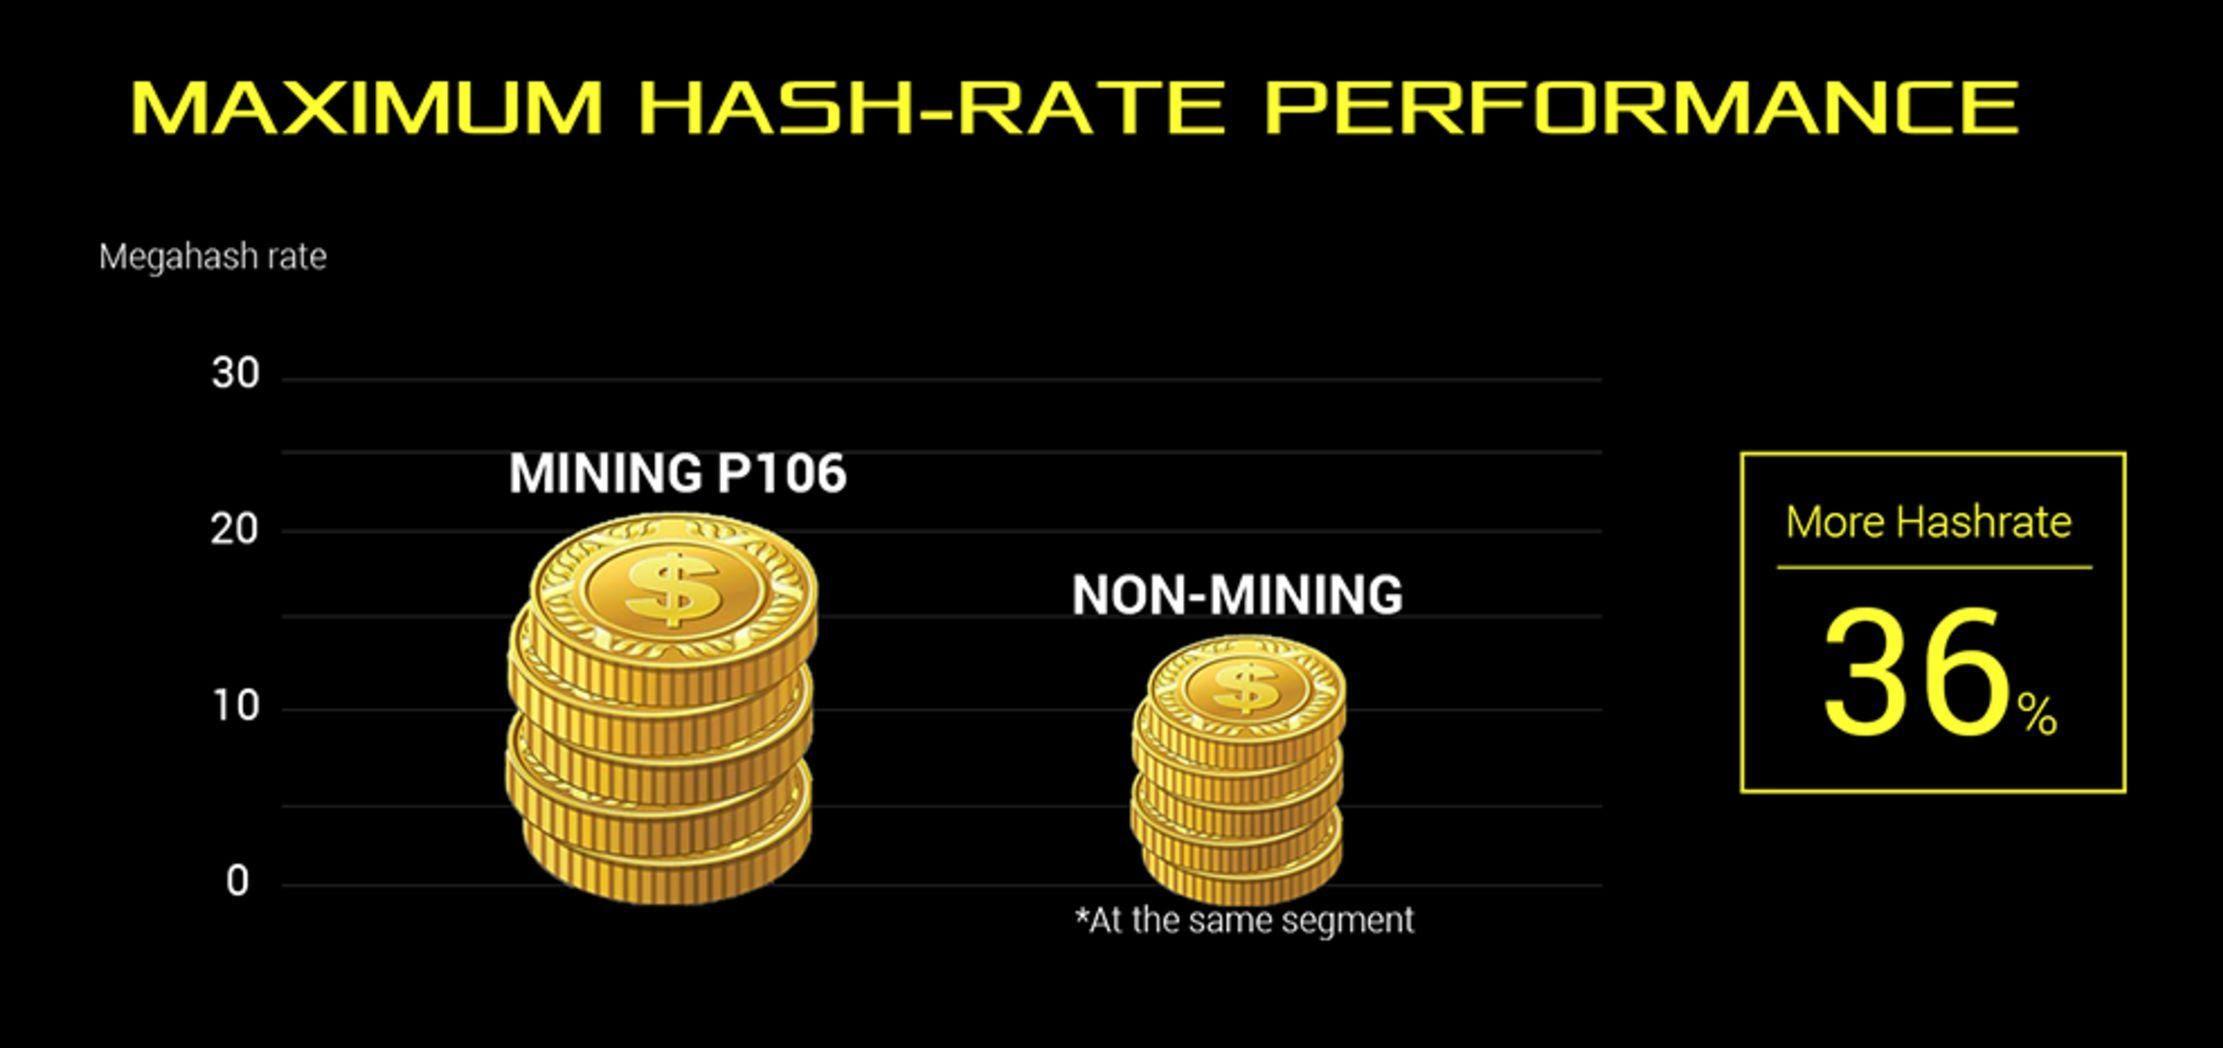 bitcoin value today inr